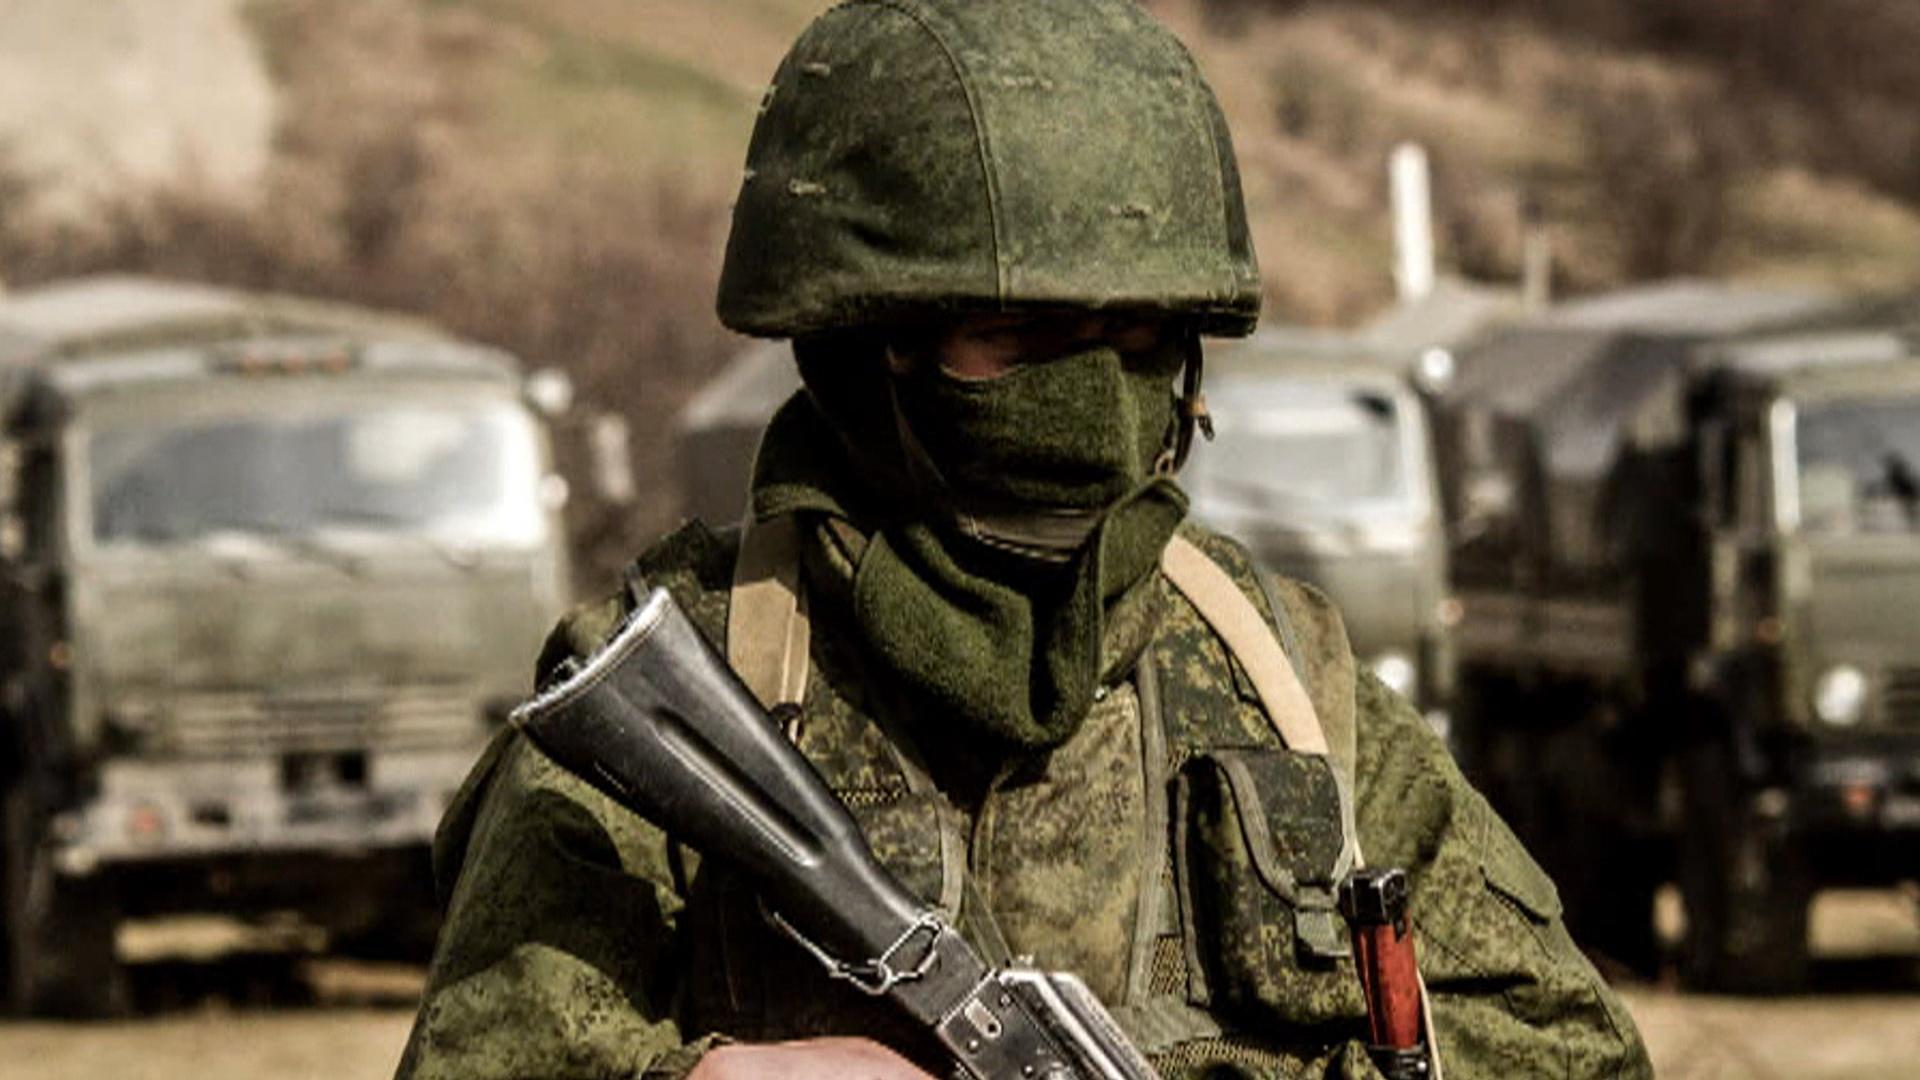 Crimea a coveted prize for Putin